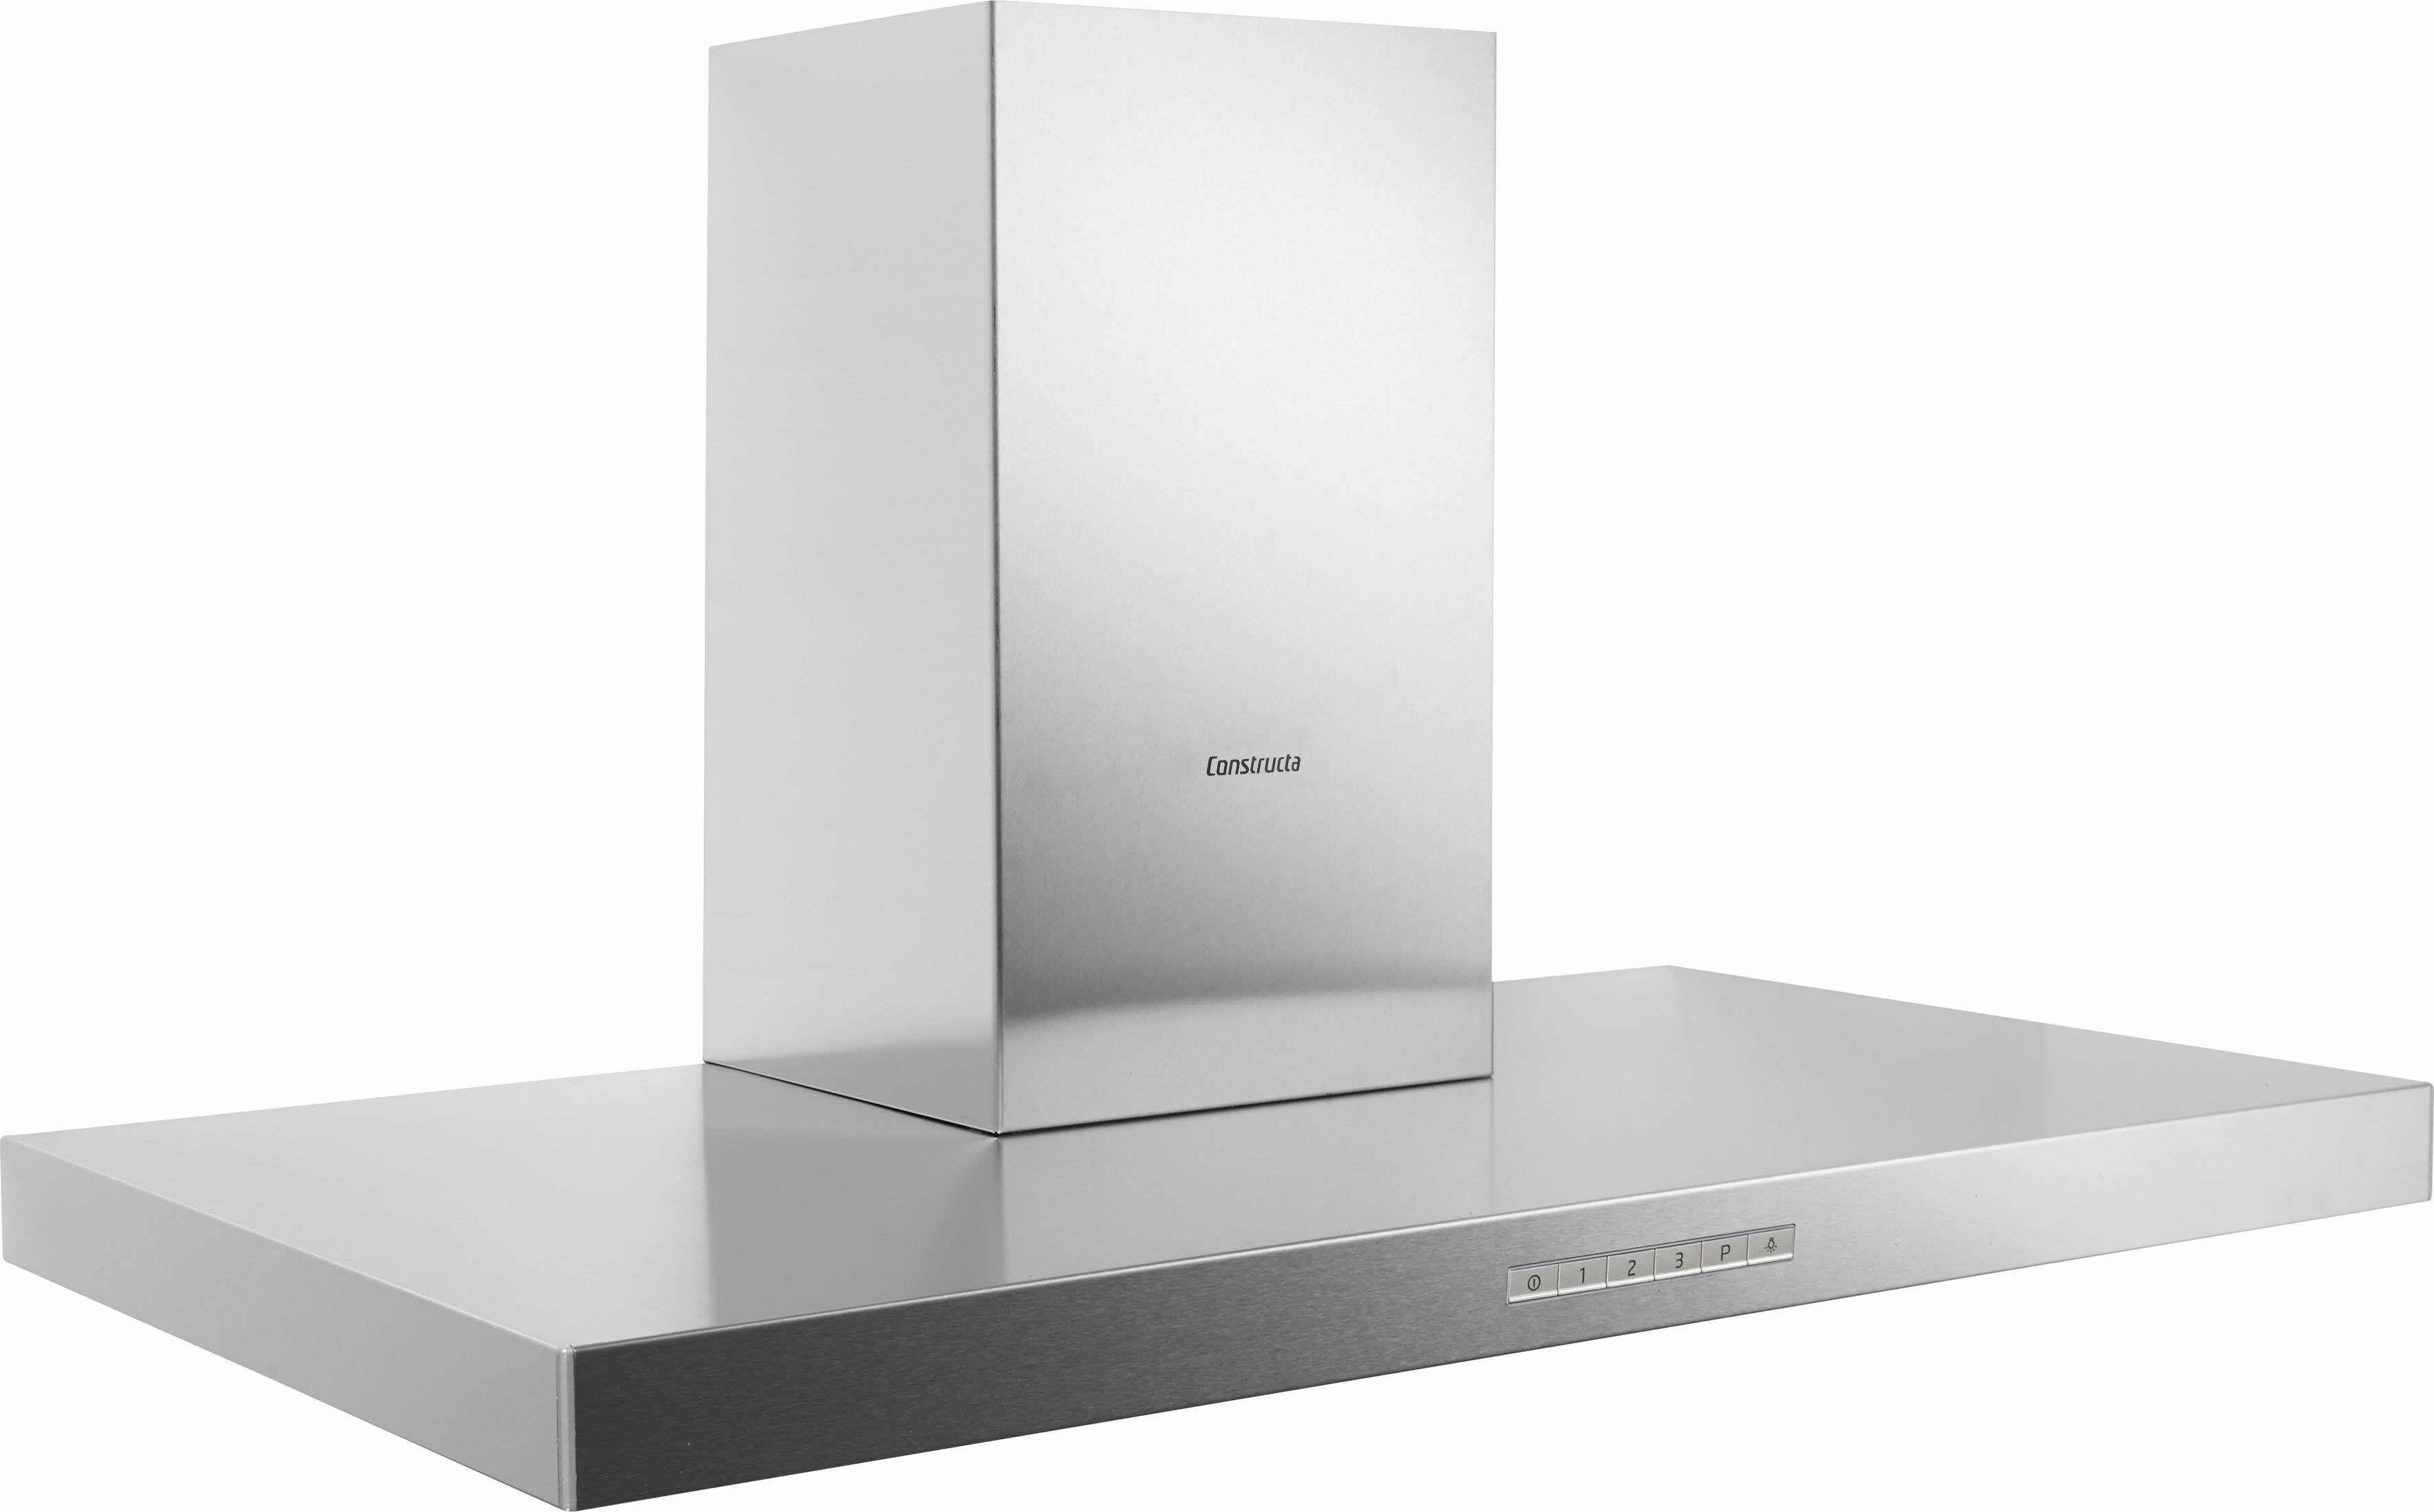 Constructa Wandhaube CD639253, Energieeffizienzklasse A